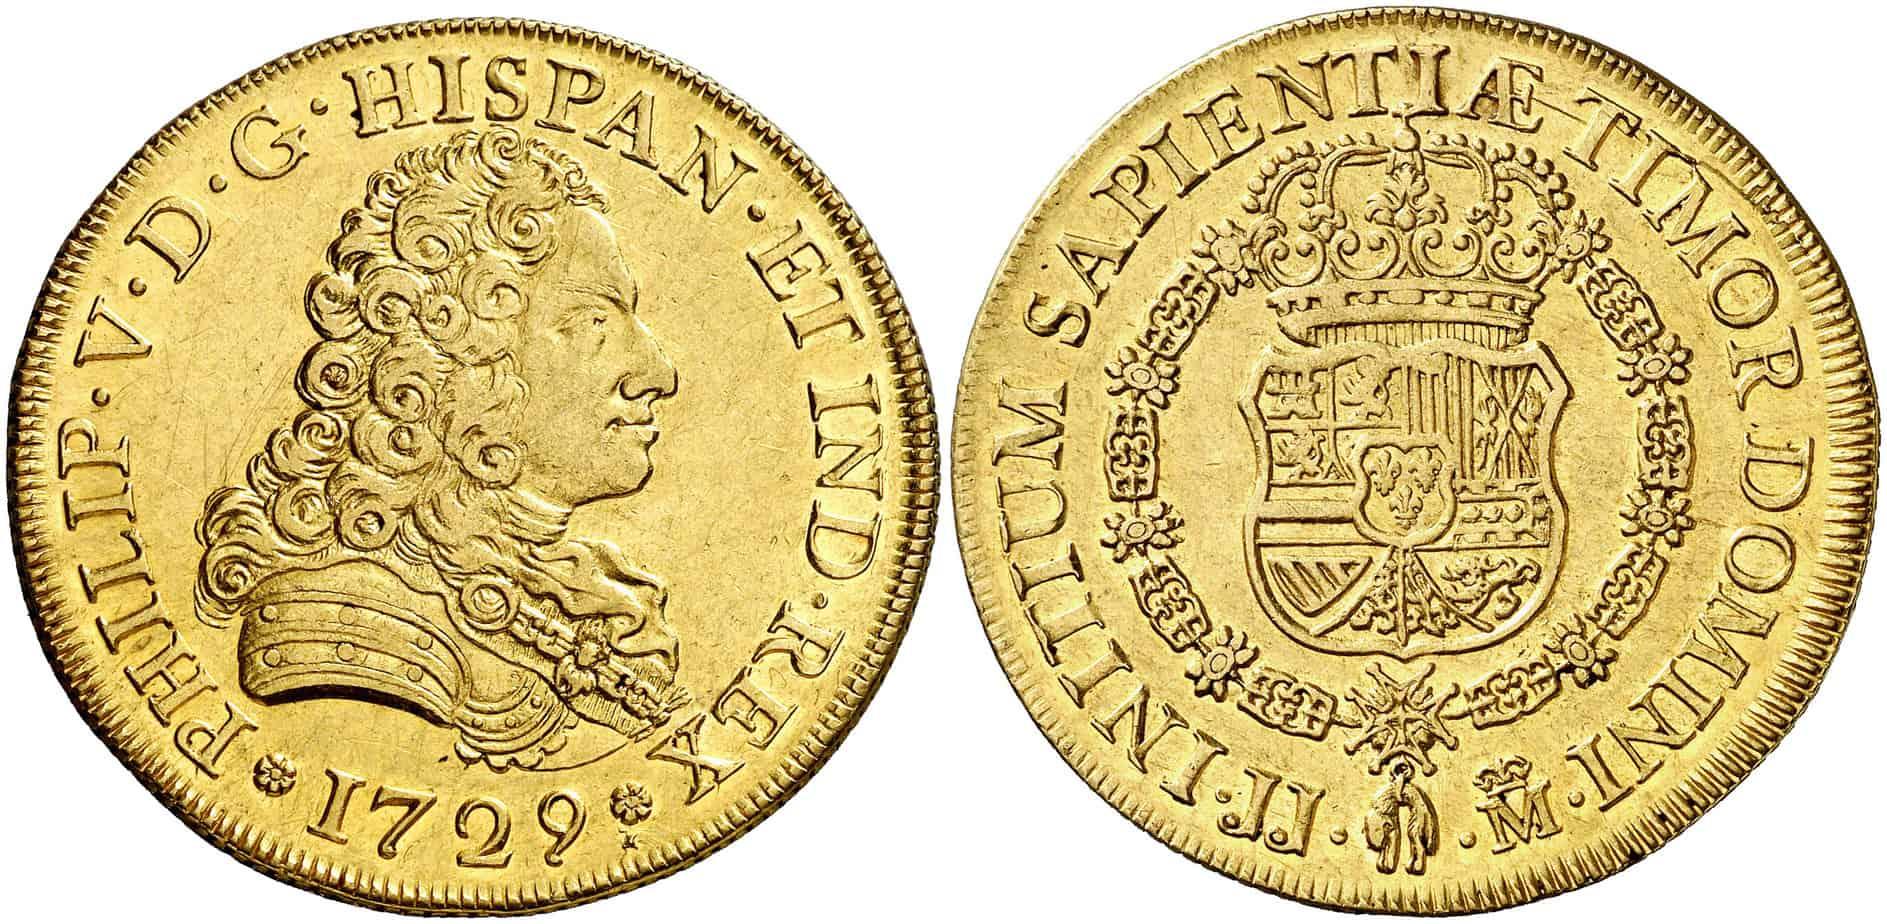 8 escudos de Madrid de 1729. Subastado por Áureo & Calicó en marzo de 2015.